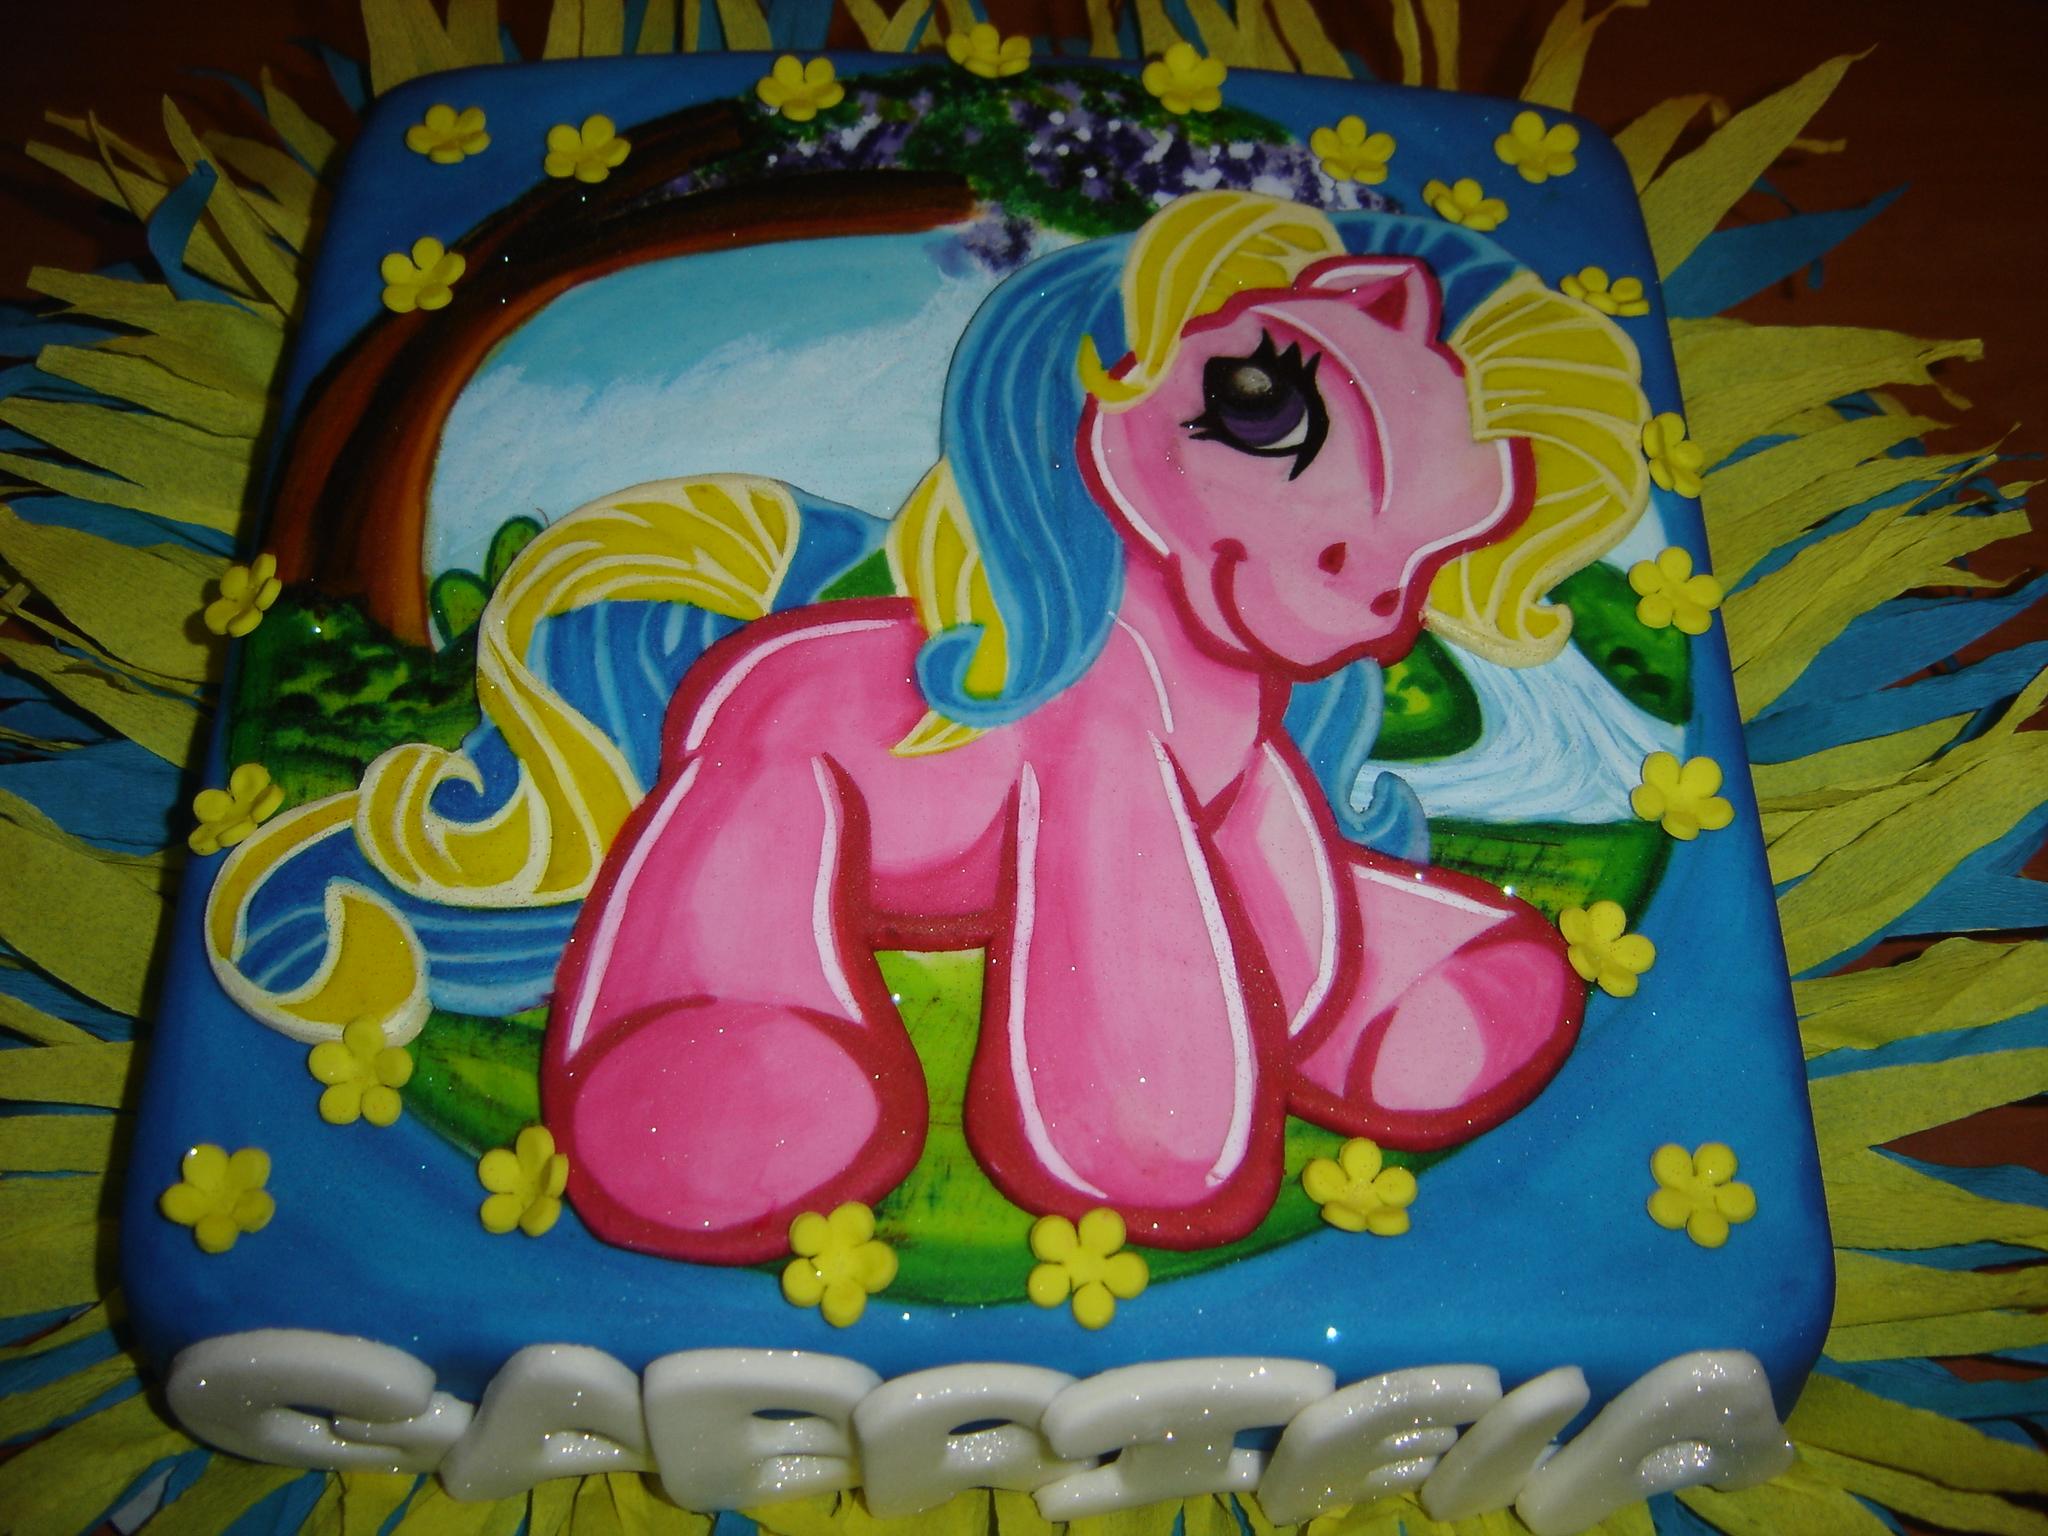 Chupeteras de my little pony - Imagui